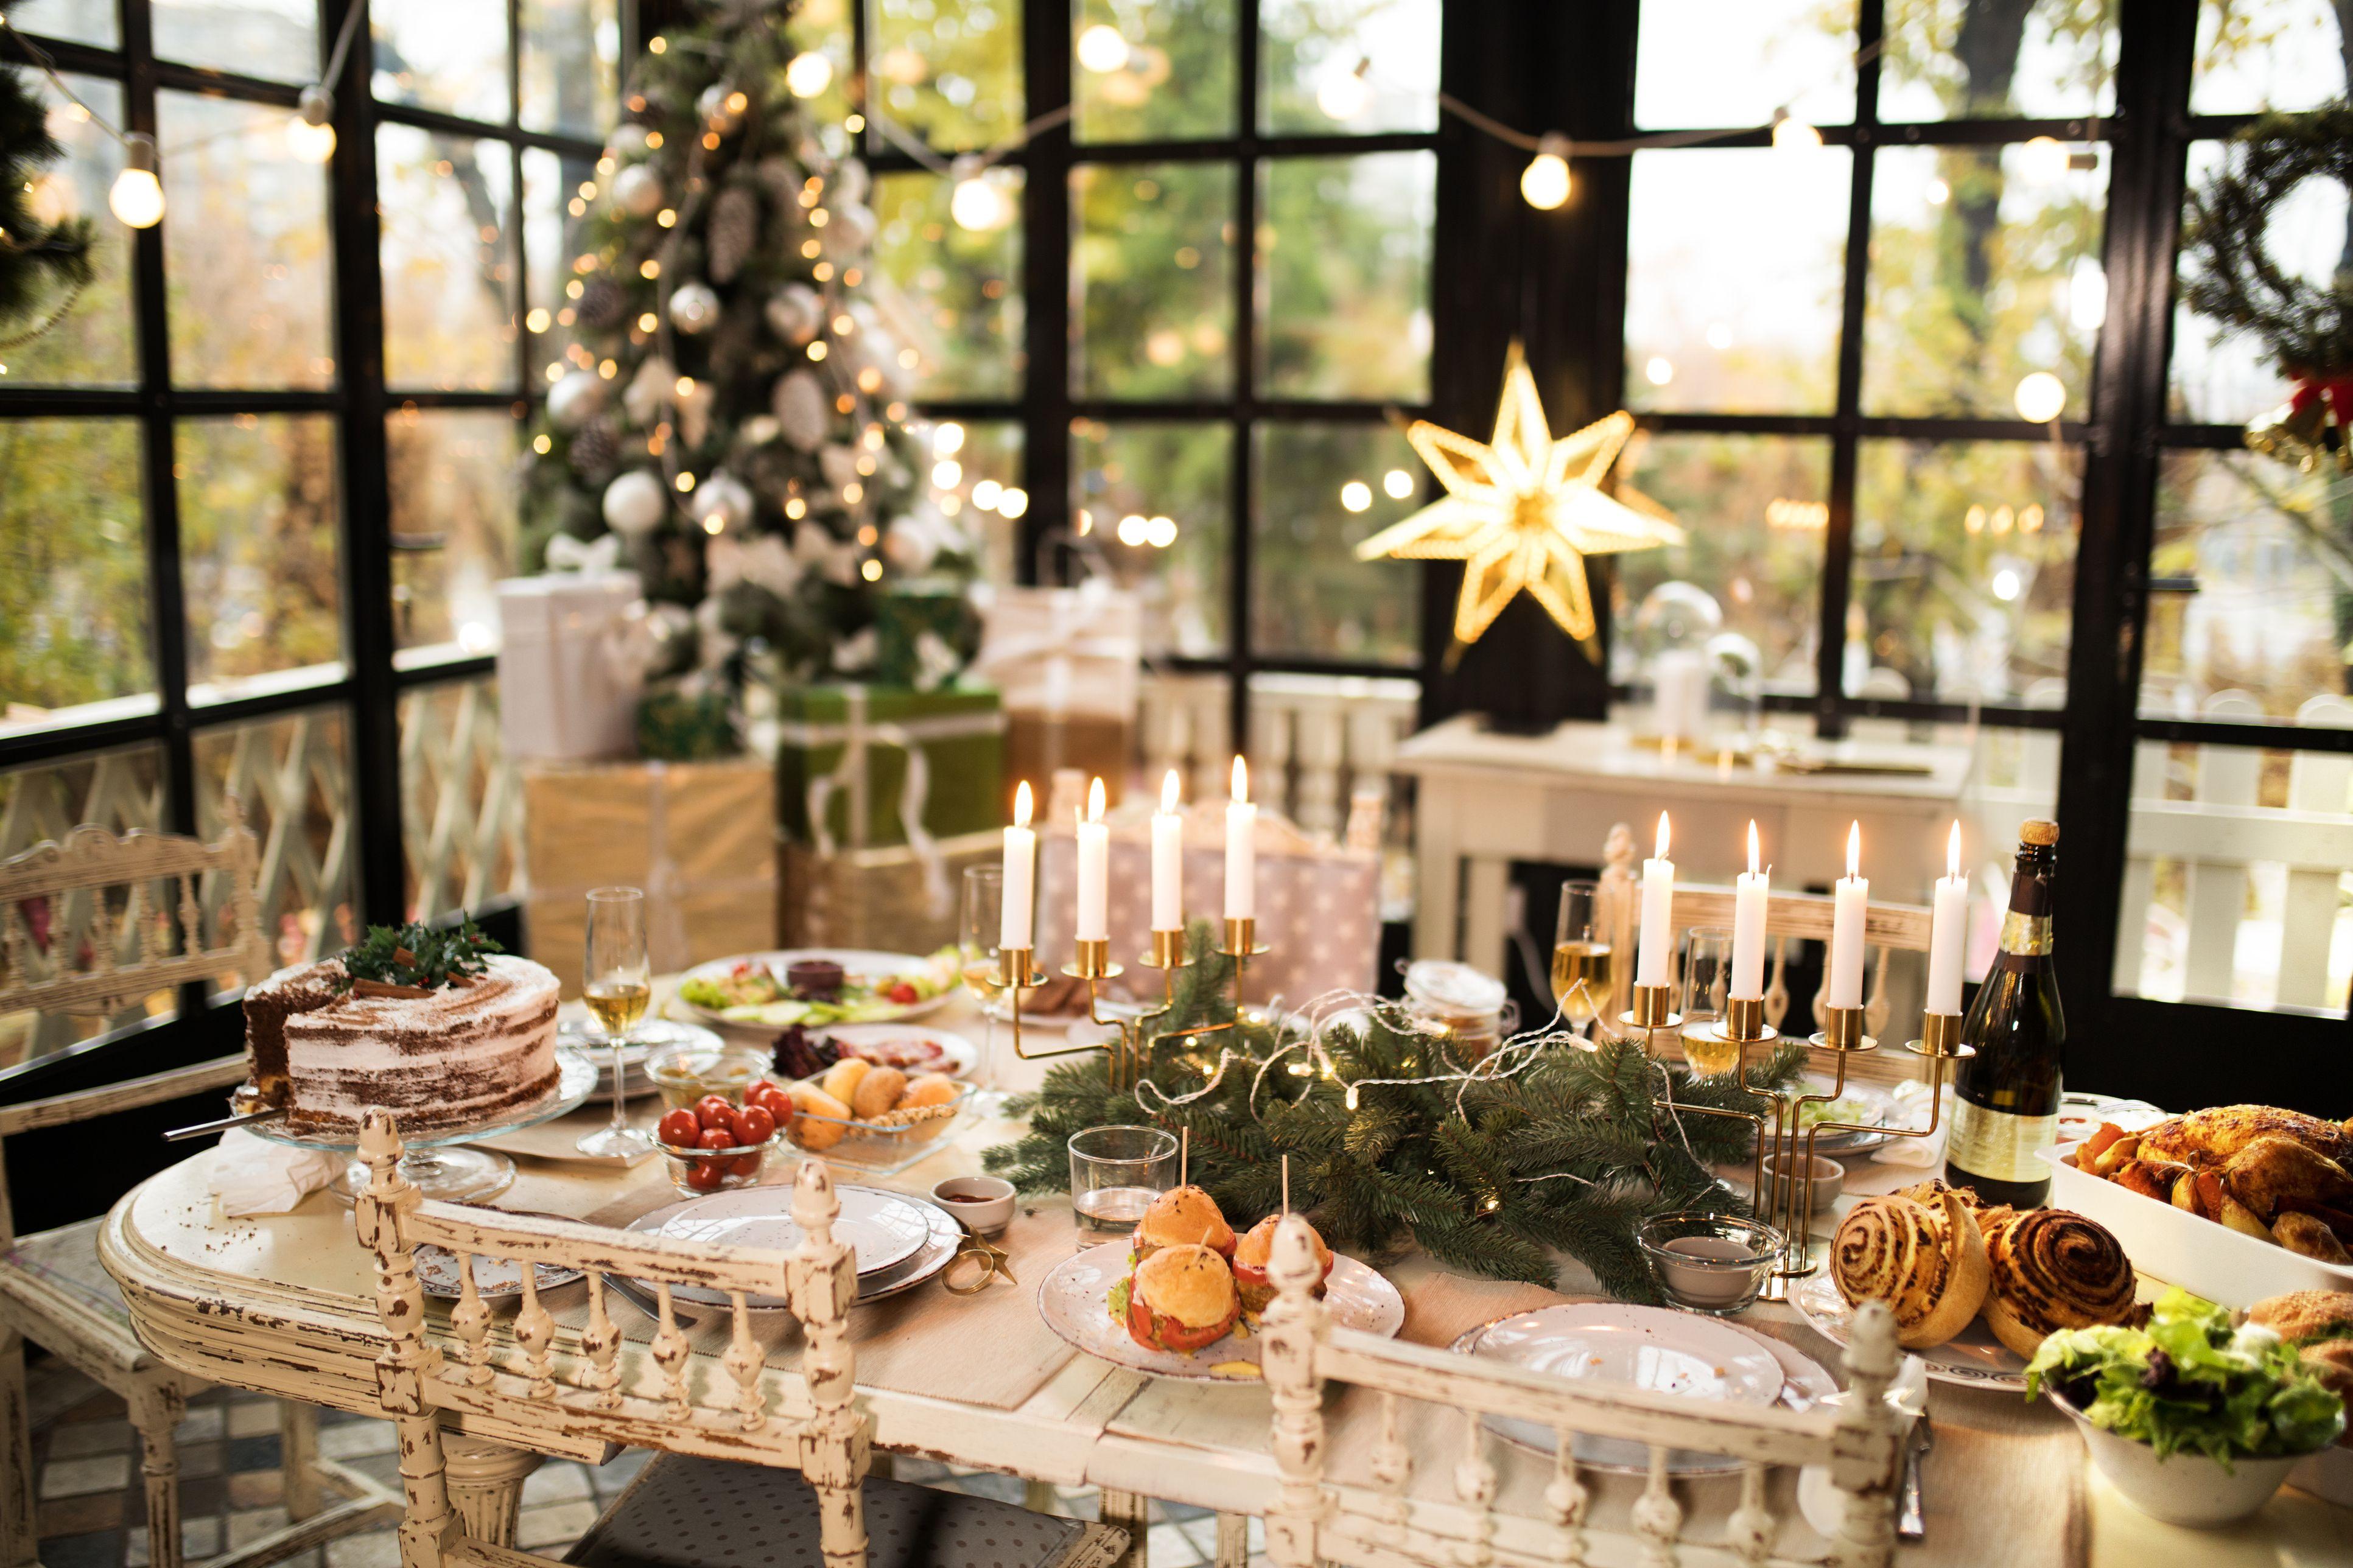 Christmas Table Centrepiece Ideas \u2013 Simple Ways To Decorate